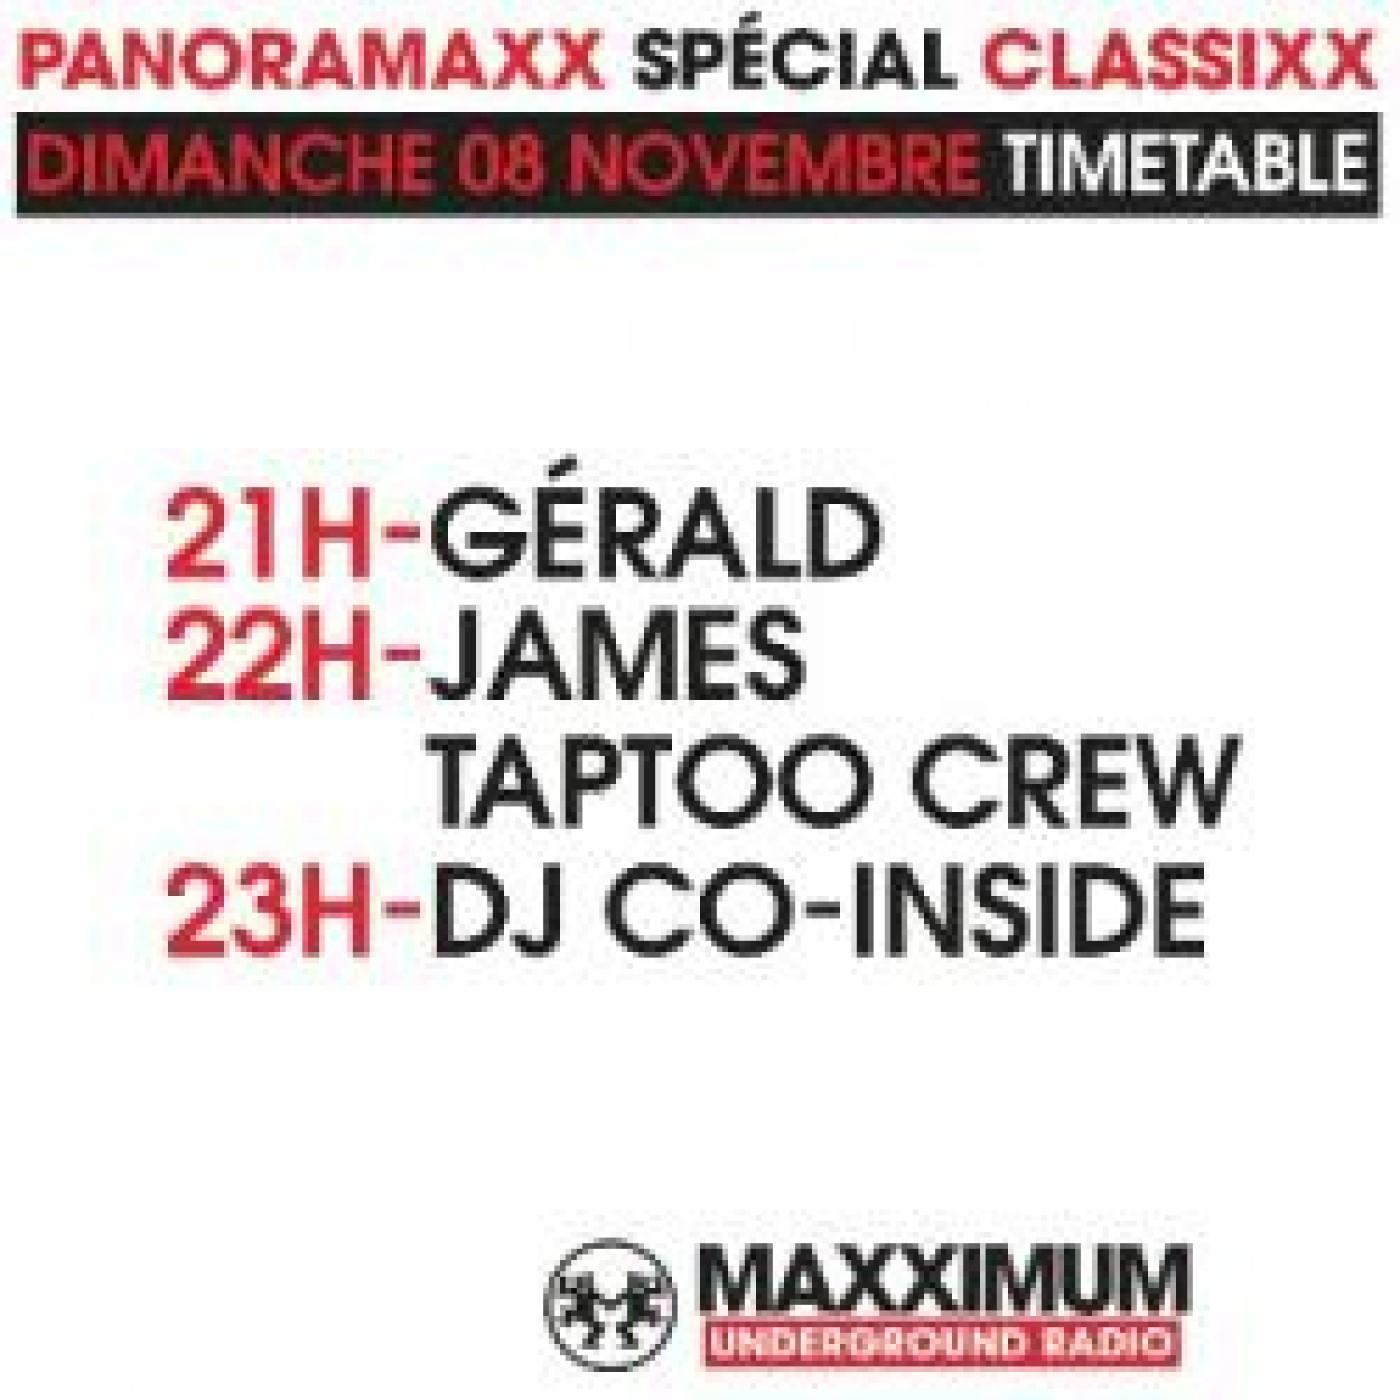 PANORAMAXX CLASSIXX : DJ CO-INSIDE